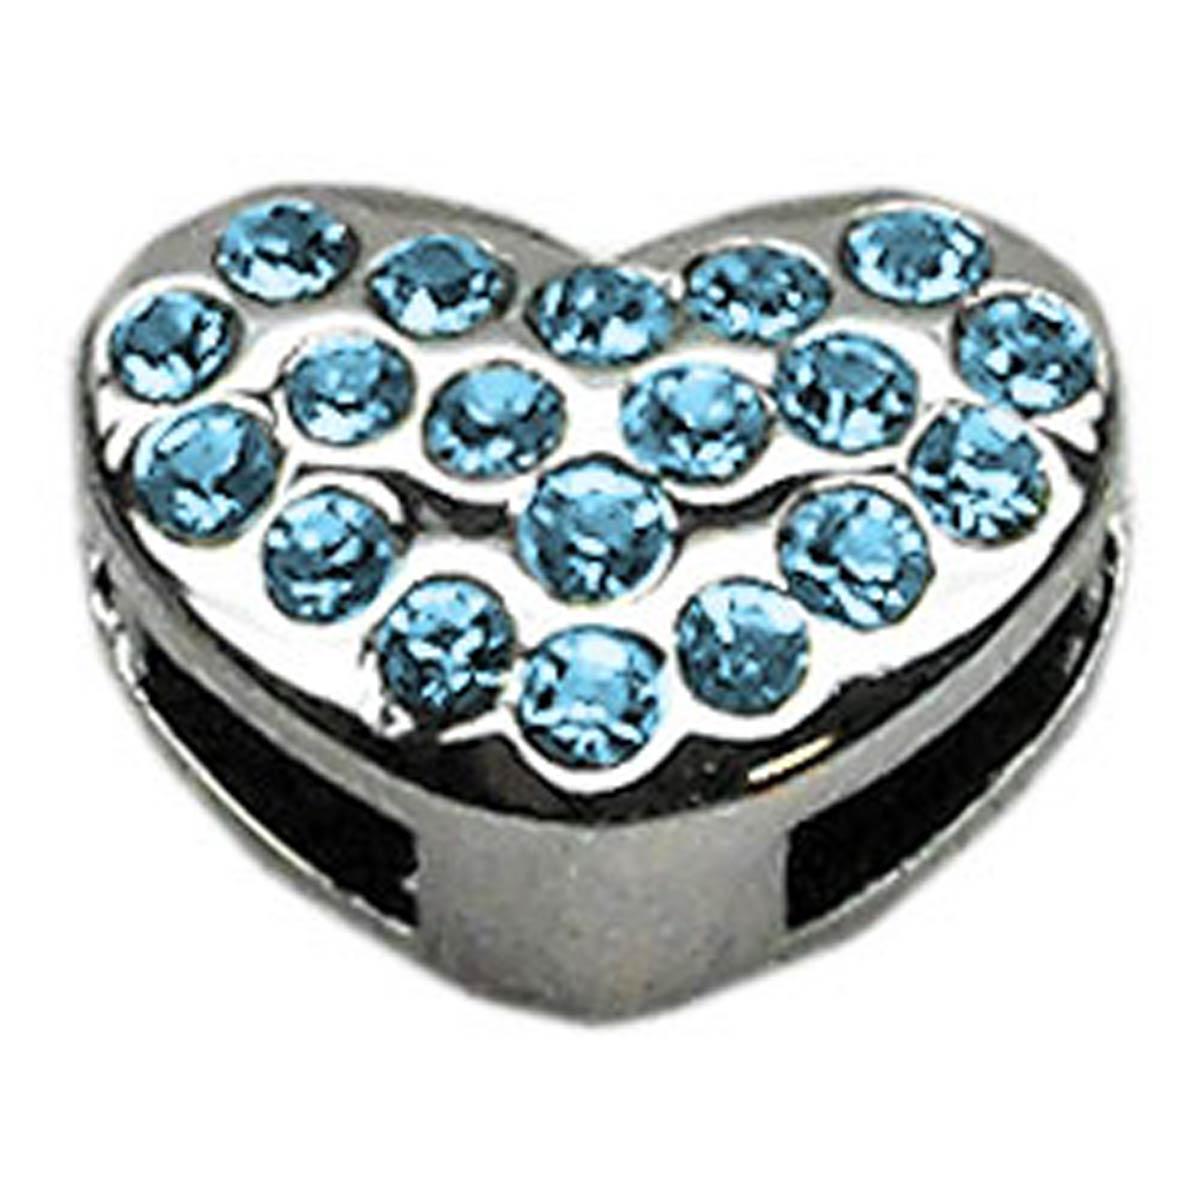 Puffy Heart Slider Dog Collar Charm - Turquoise